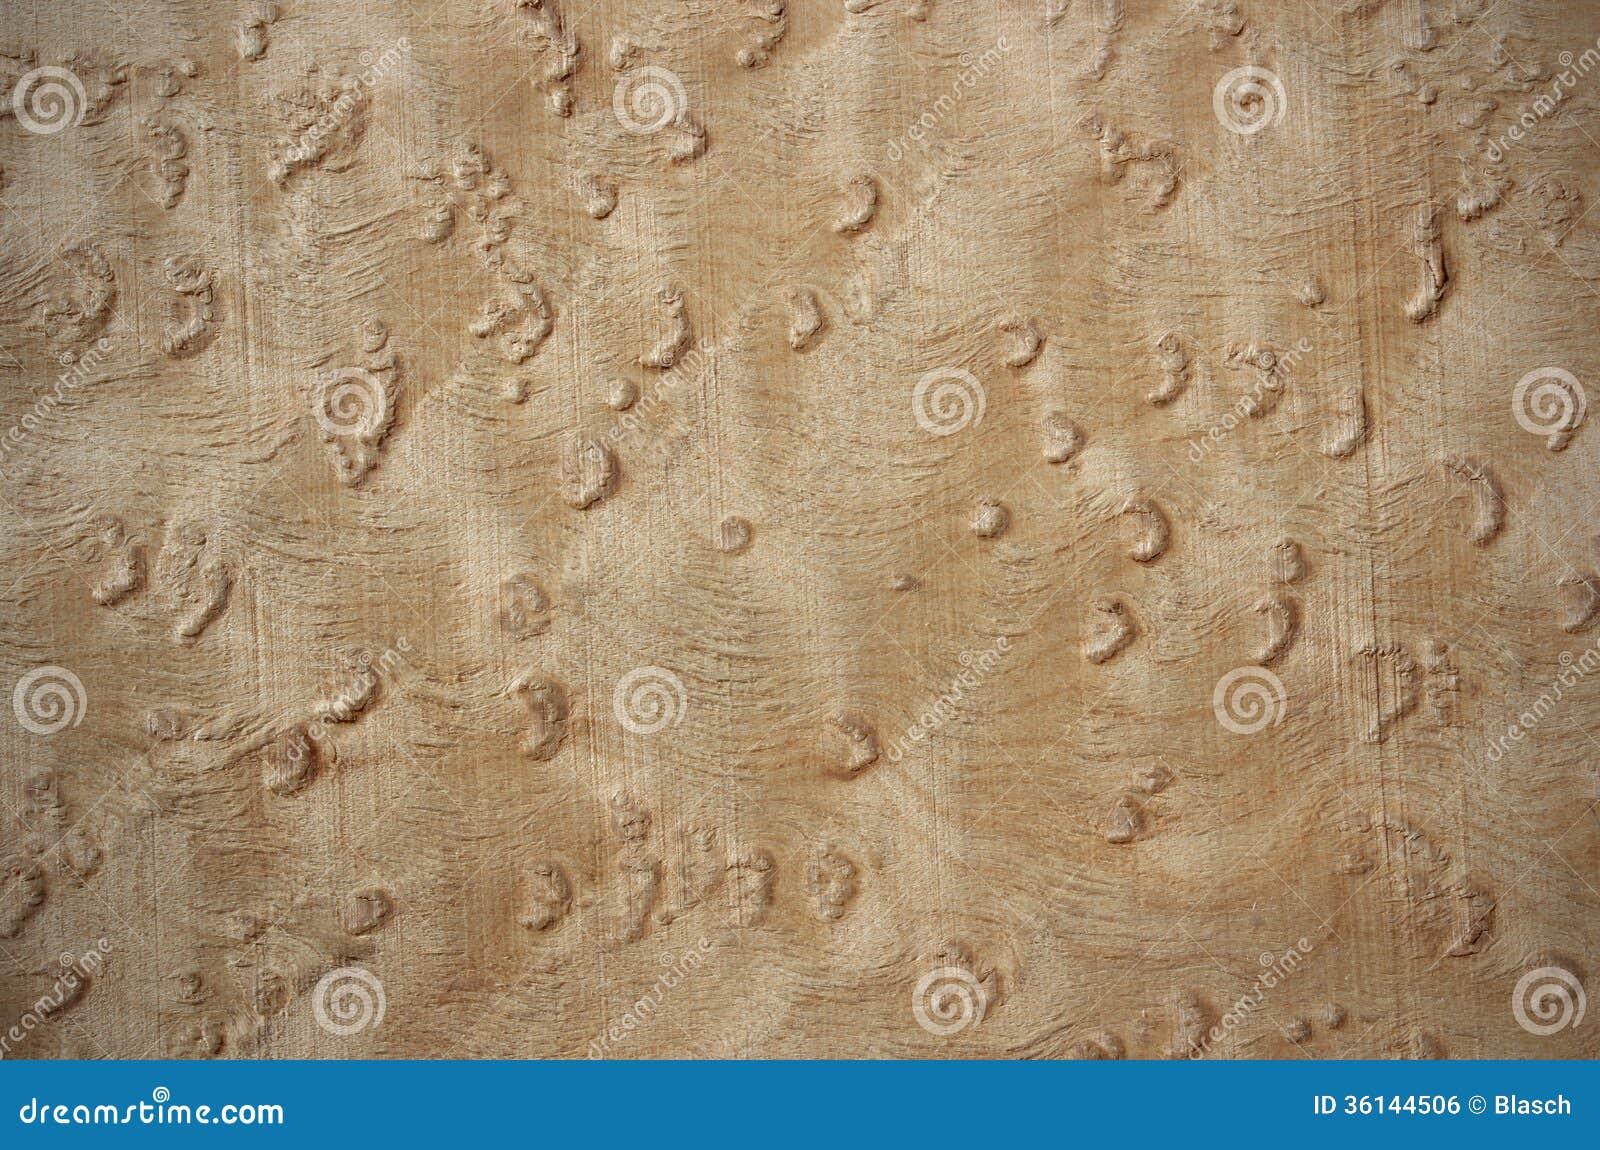 Birdseye maple veneer wood surface stock photo image